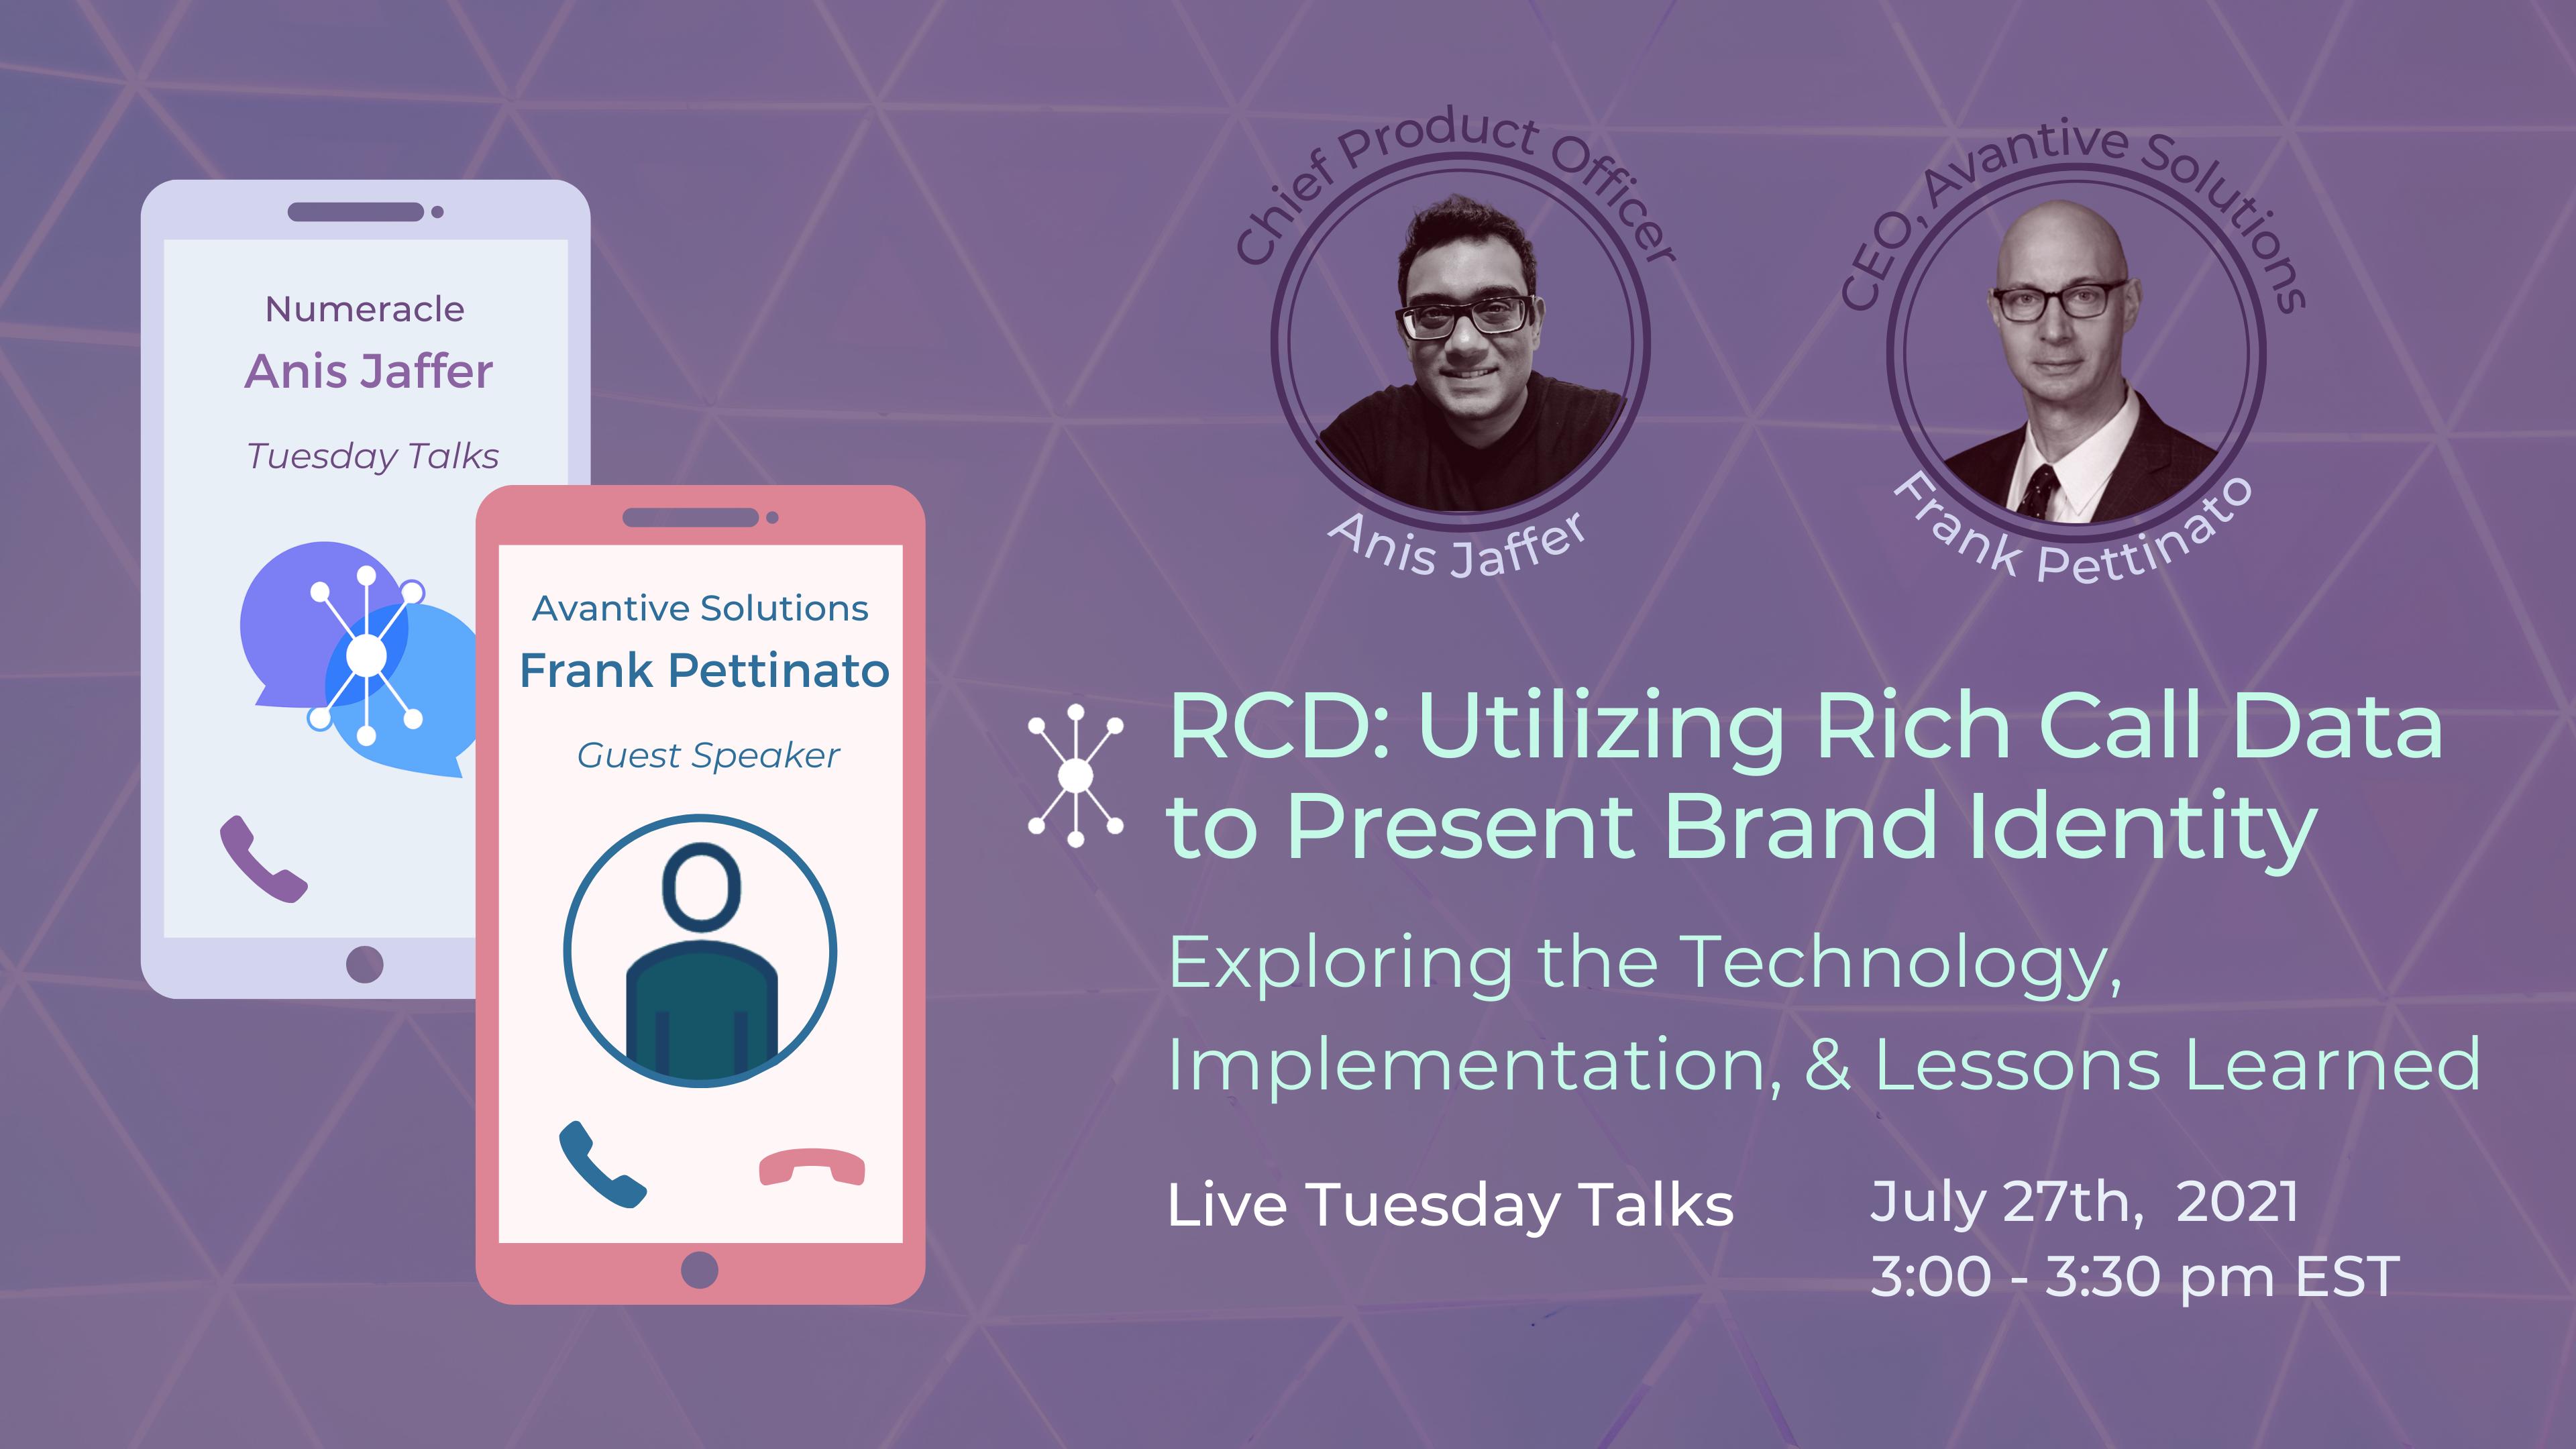 RCD: Utilizing Rich Call Data to Present Brand Identity